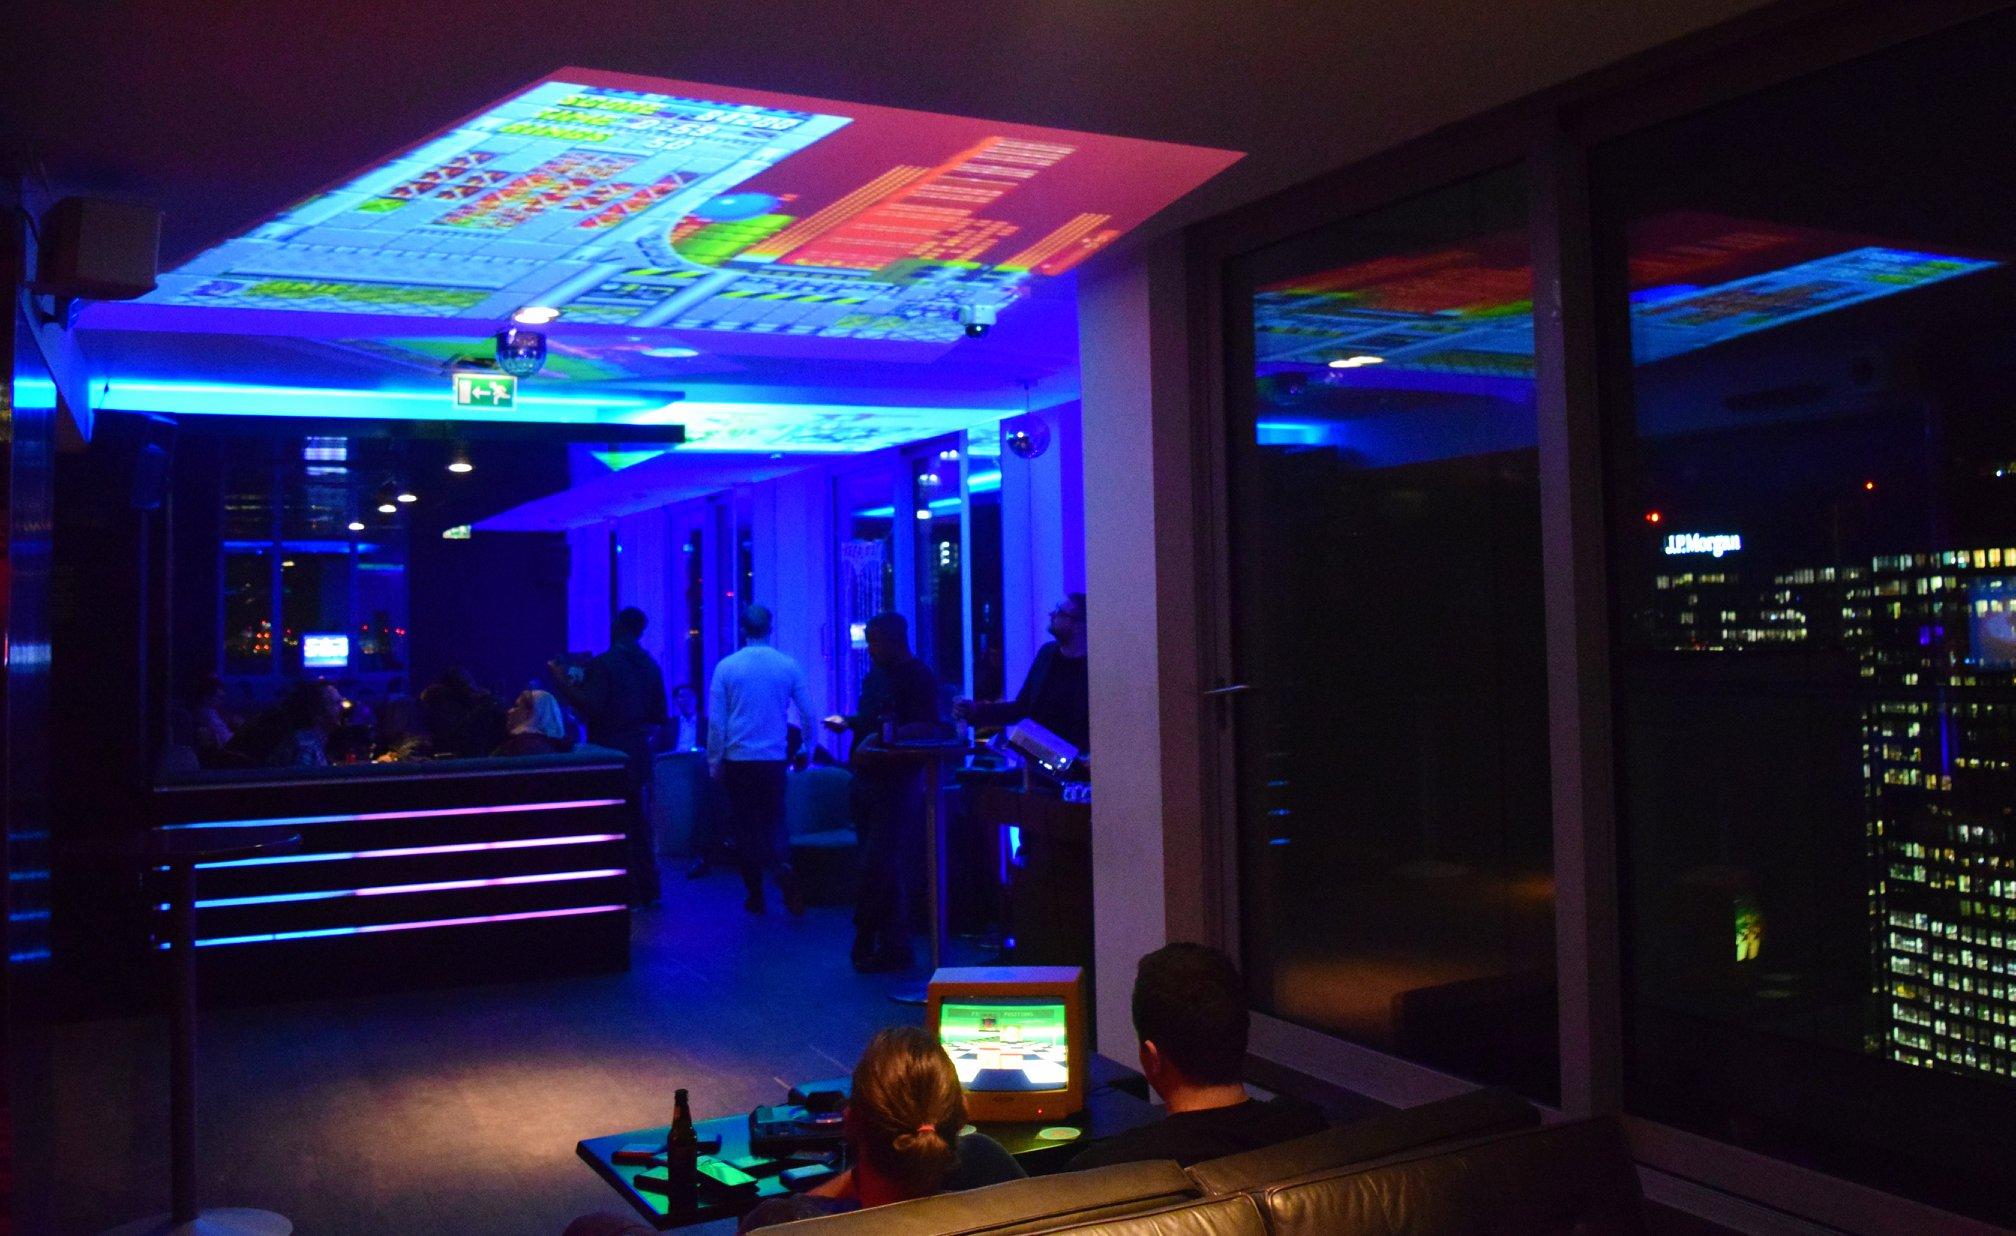 16 Bit Sky Bar 500ft High Sega Retro Gaming Cocktails